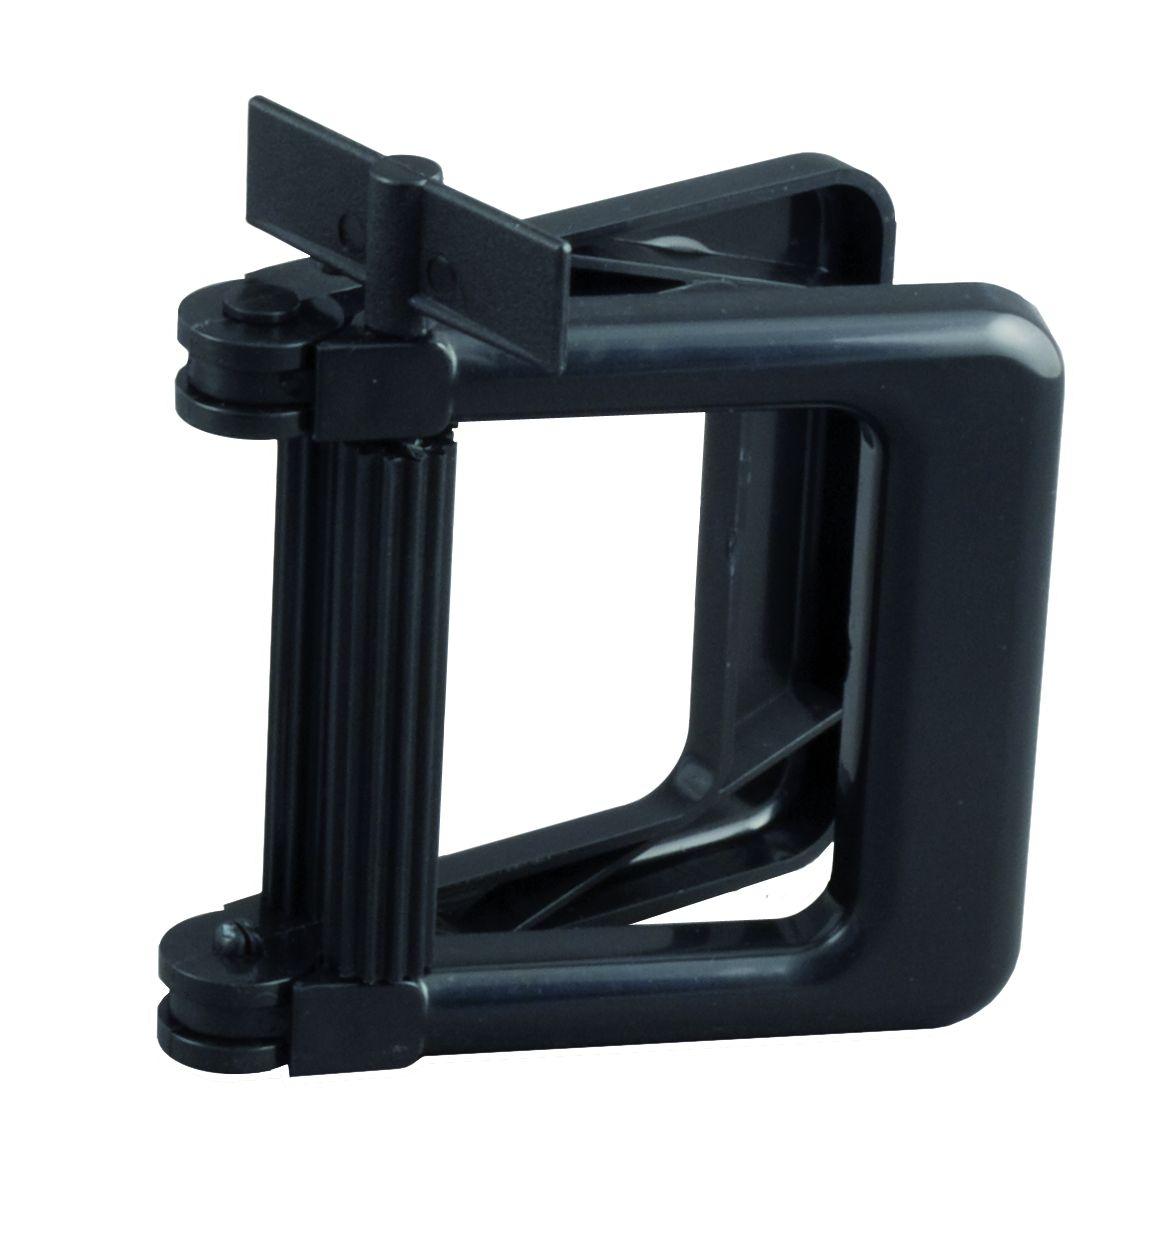 Tubenpresse Kunststoff schwarz